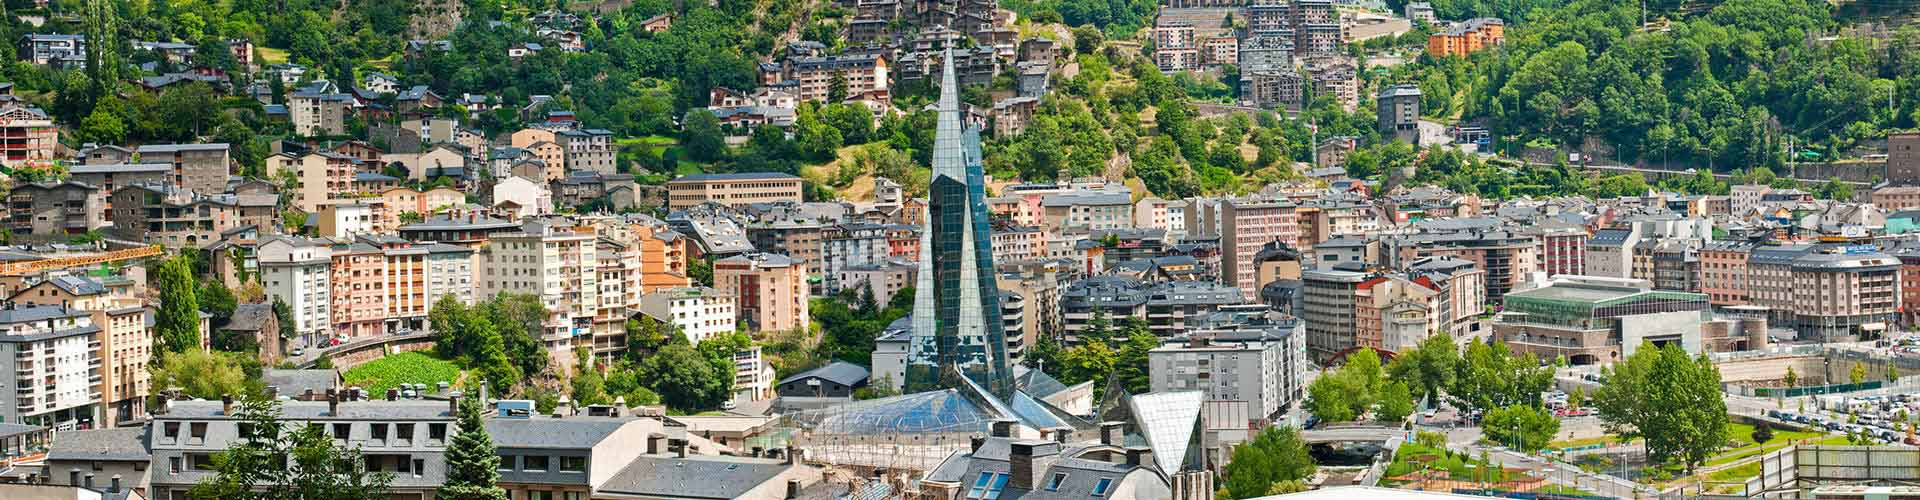 Andorra la Vella - Hostelů v Andorra la Vella. Mapy pro Andorra la Vella, fotky a recenze pro každý hostel v Andorra la Vella.